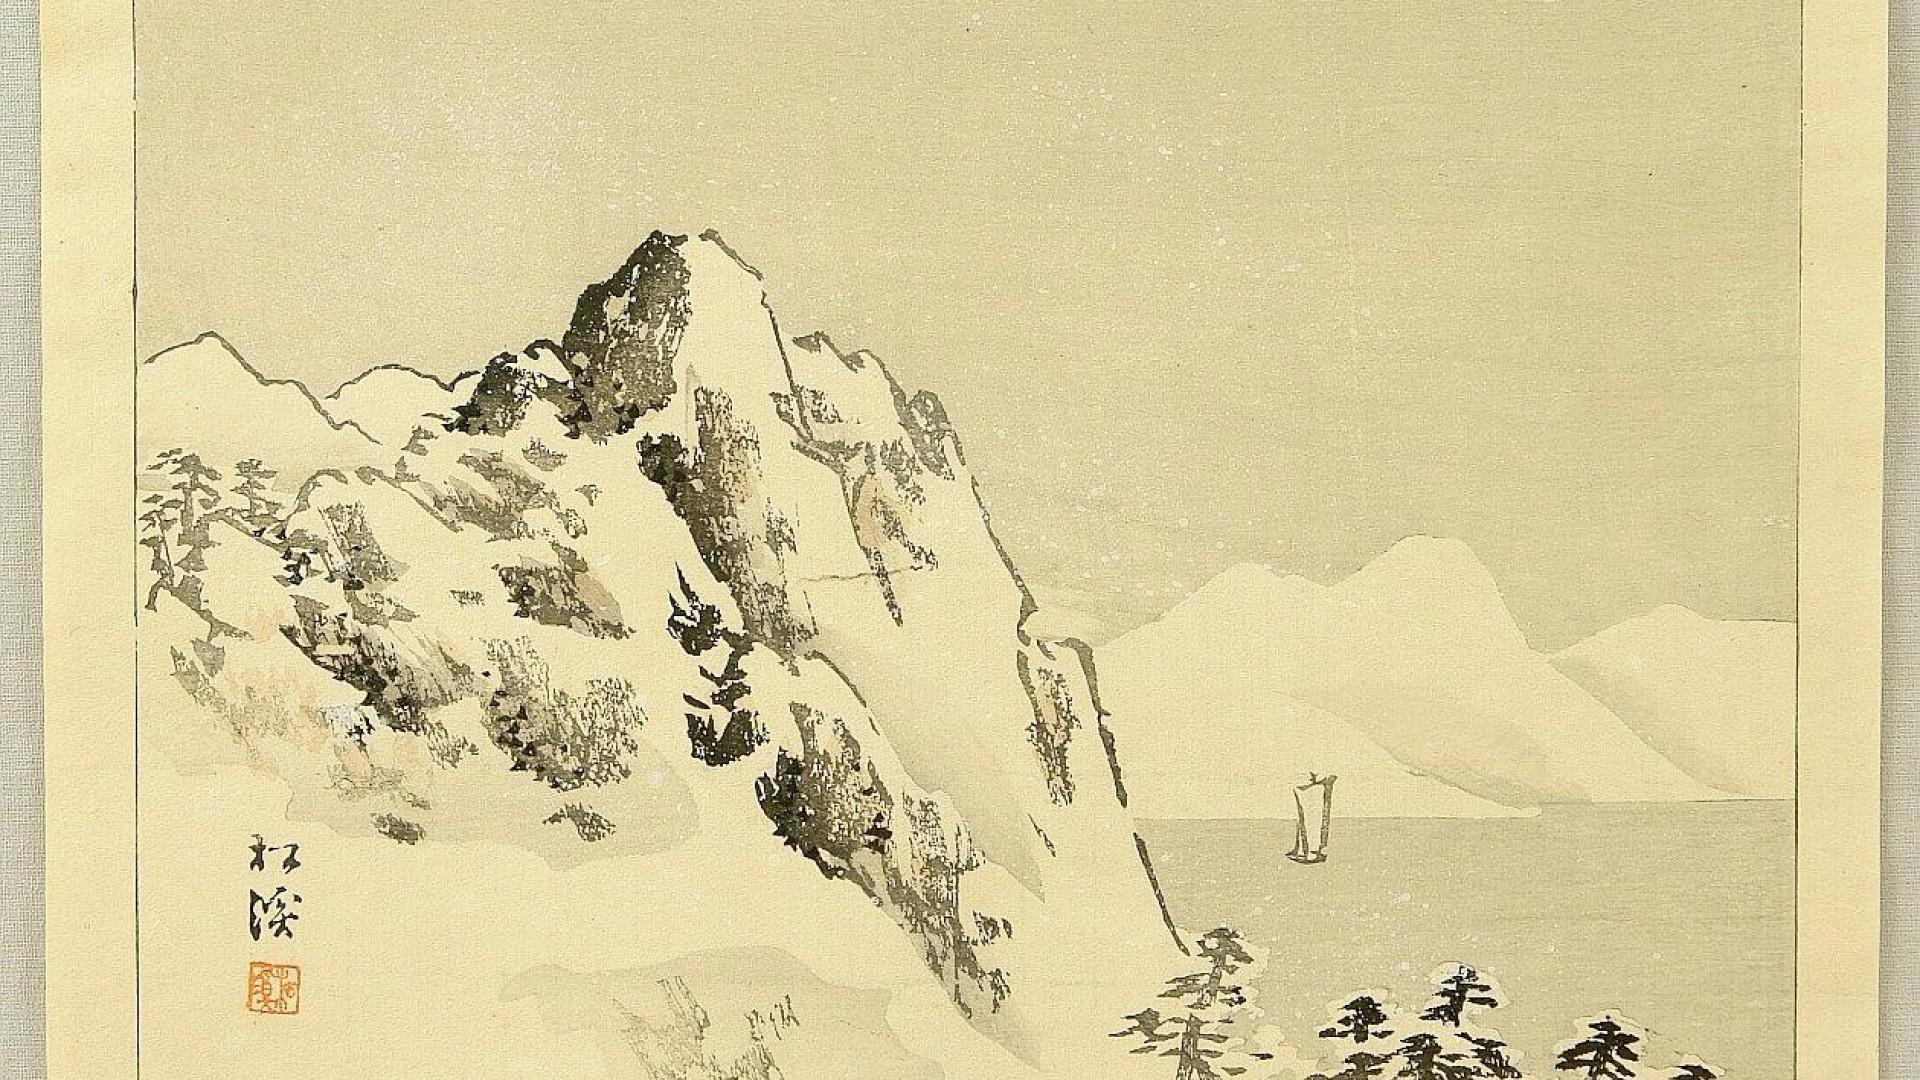 Japanese Art Wallpaper 1920x1080 43808